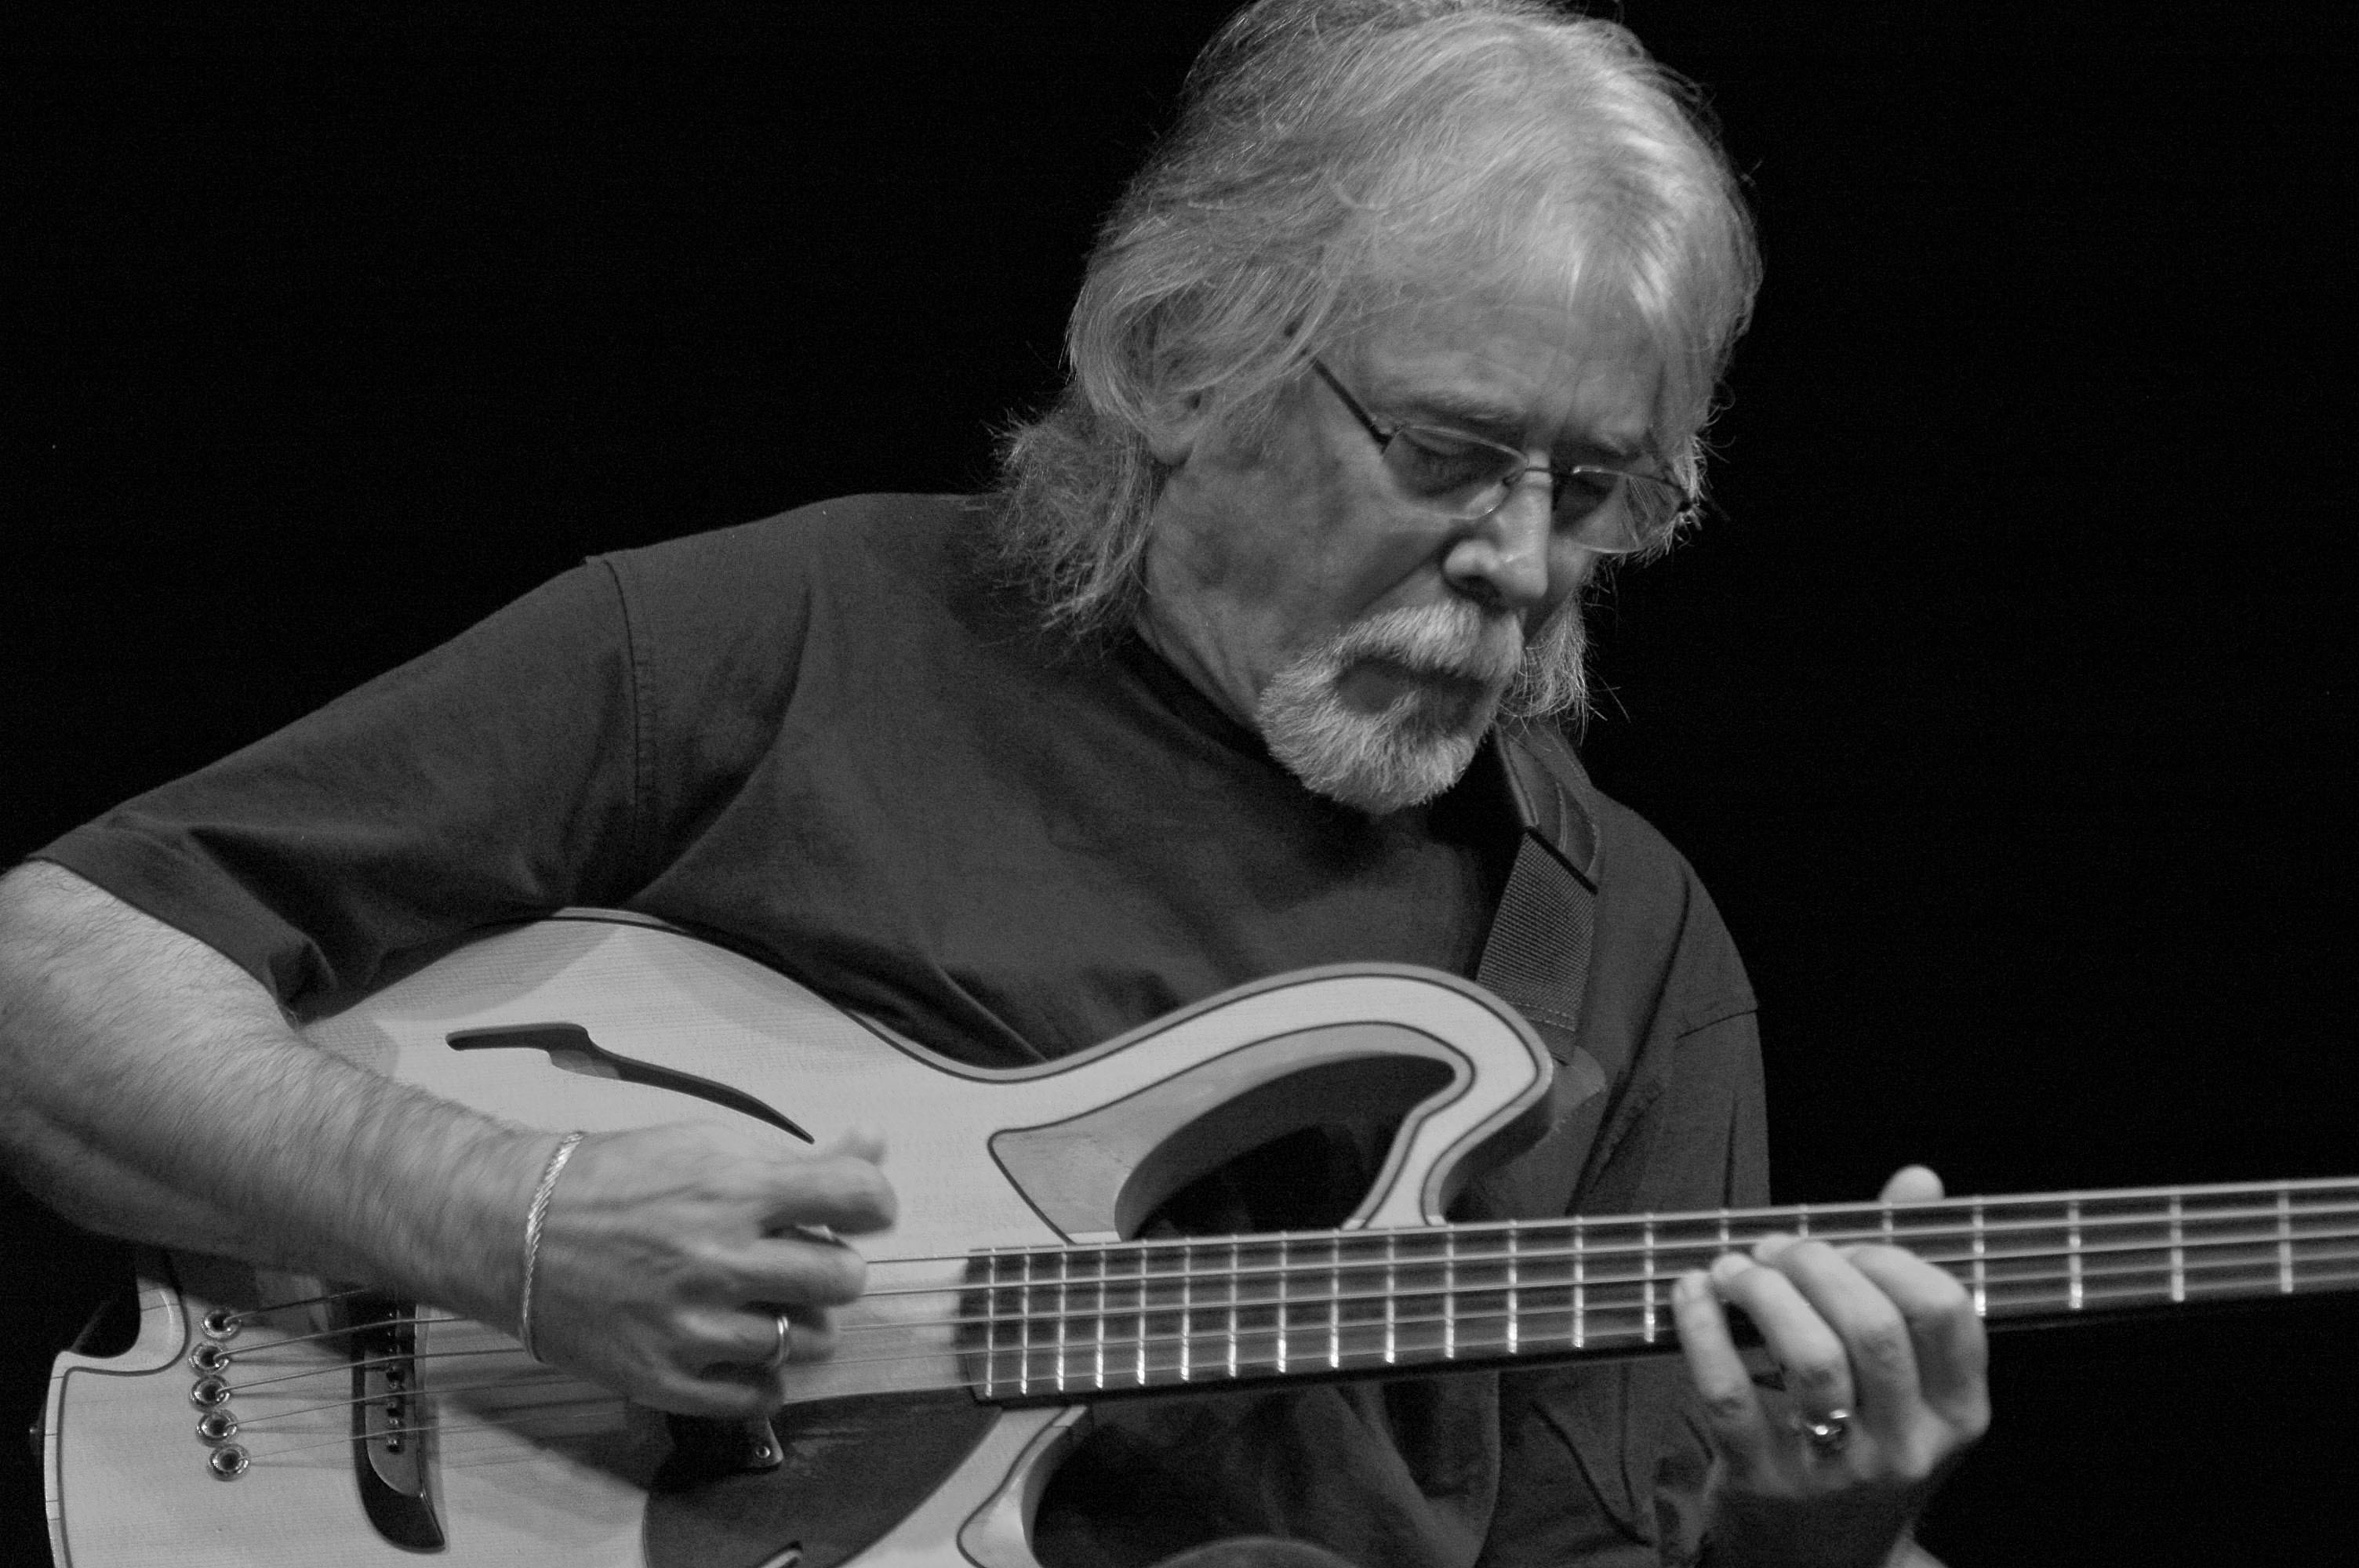 Carles Benavent, Jazzahead! 2012